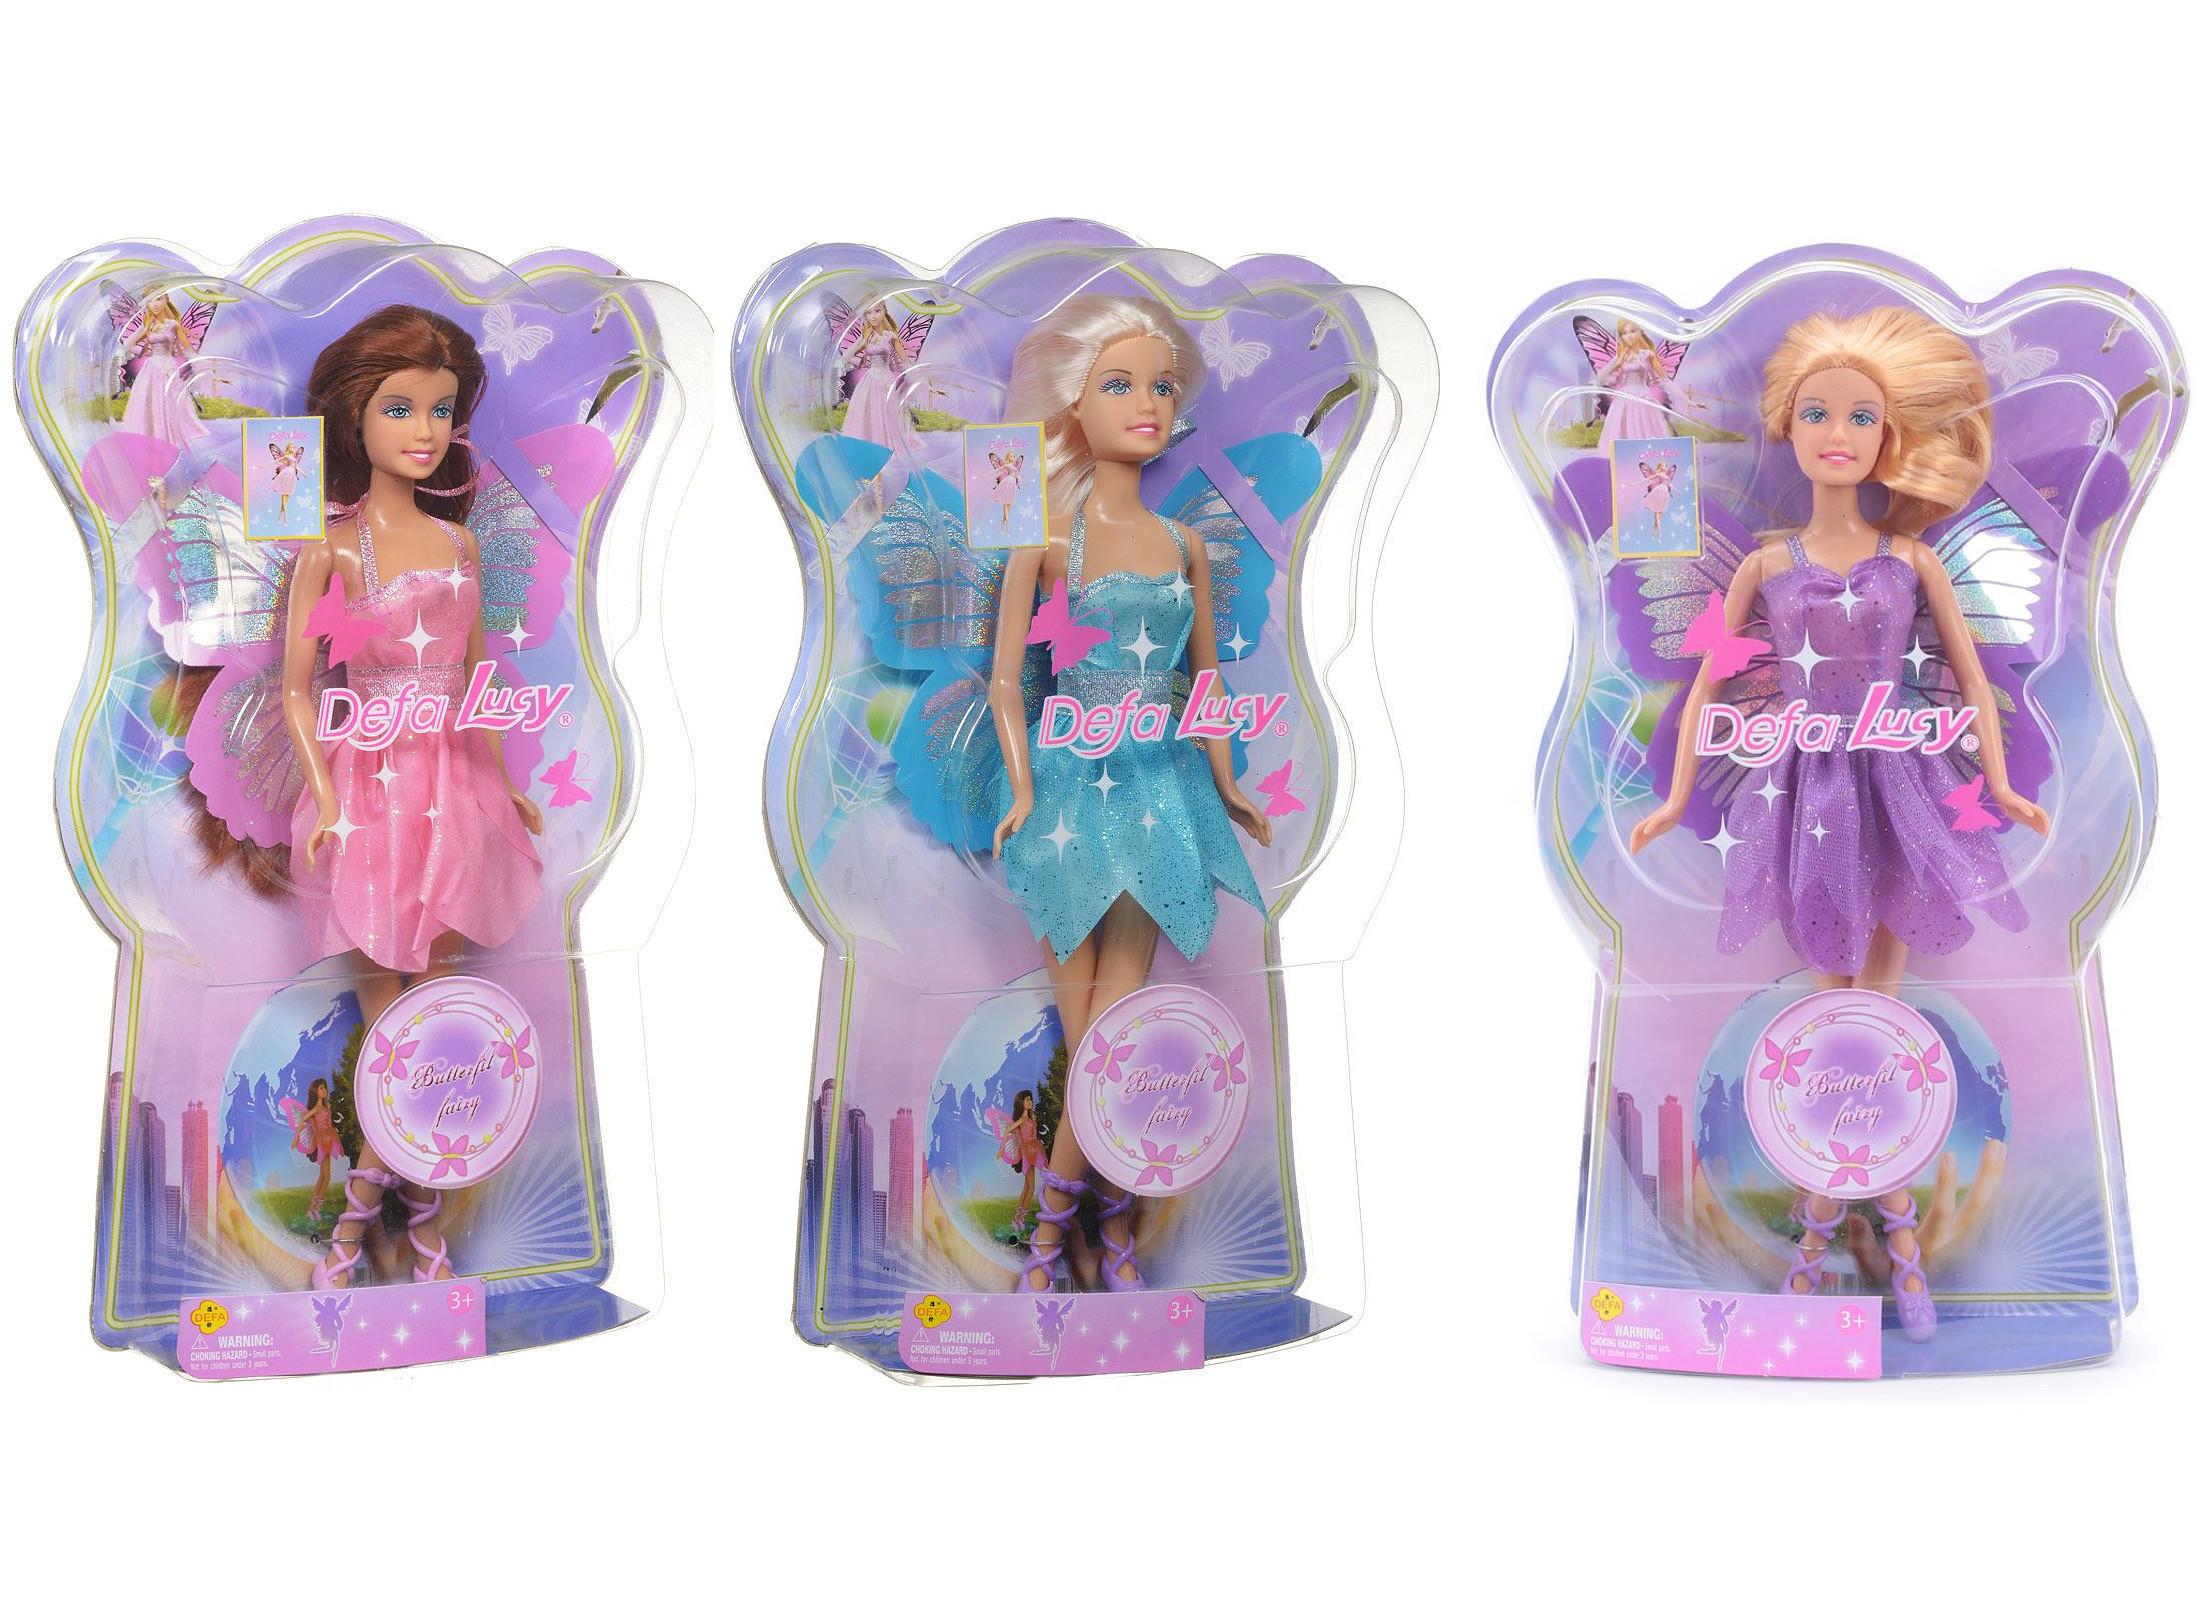 Кукла - Фея-бабочка, 29 смКуклы Defa Lucy<br>Кукла - Фея-бабочка, 29 см<br>